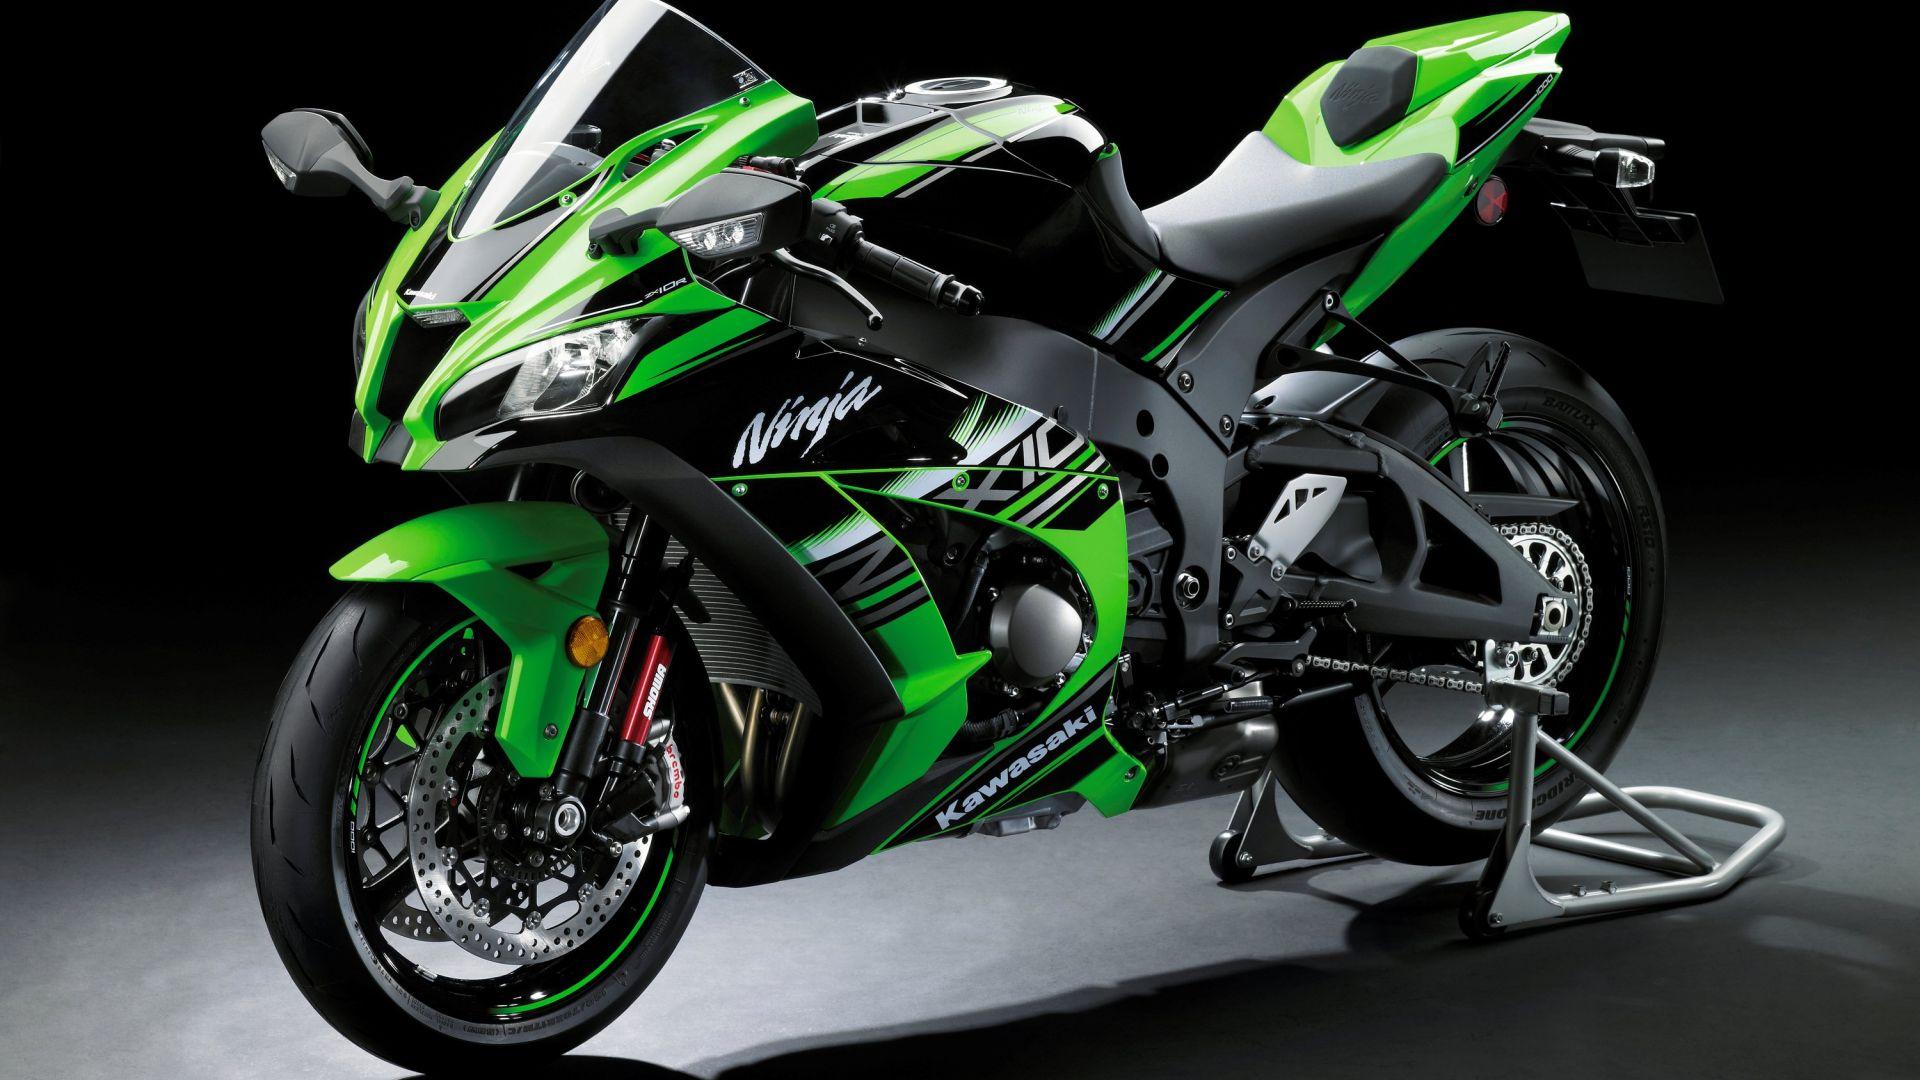 Kawasaki Ninja H2r Sport Bikes Best Motorcycle Horizontal